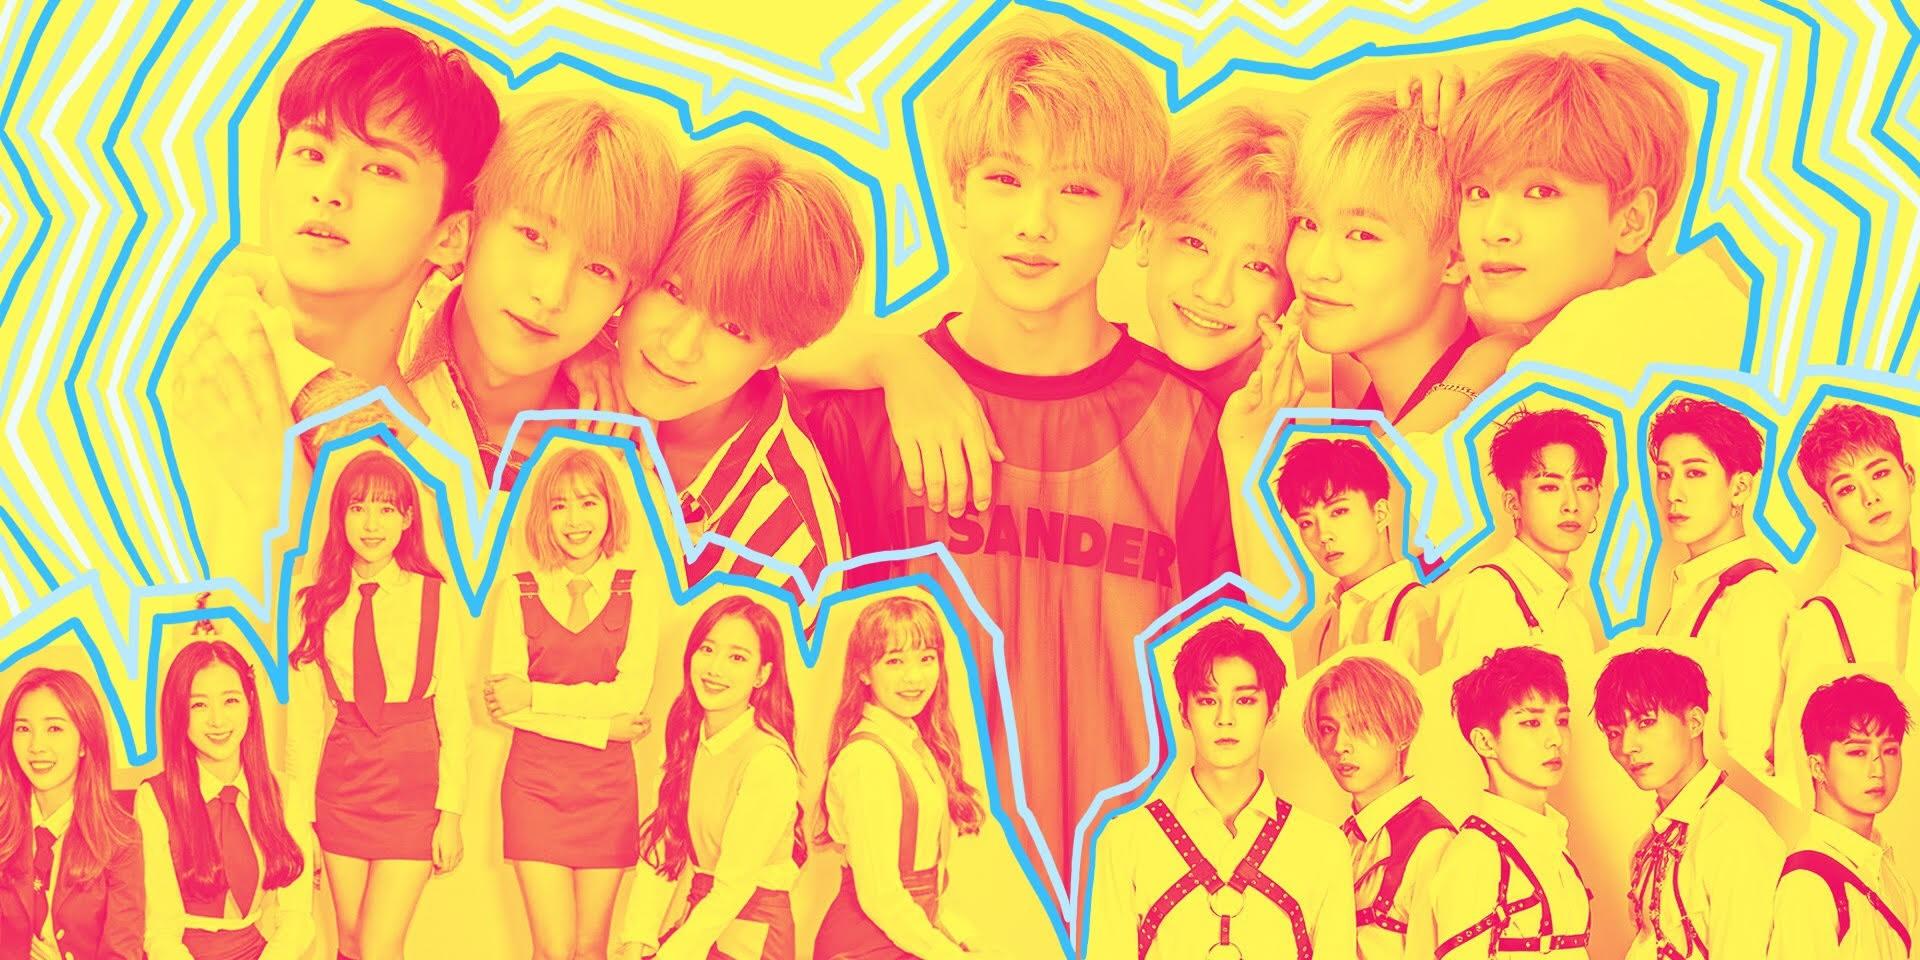 NCT Dream, NOIR, April to perform at K-POP Friendship Concert in Manila